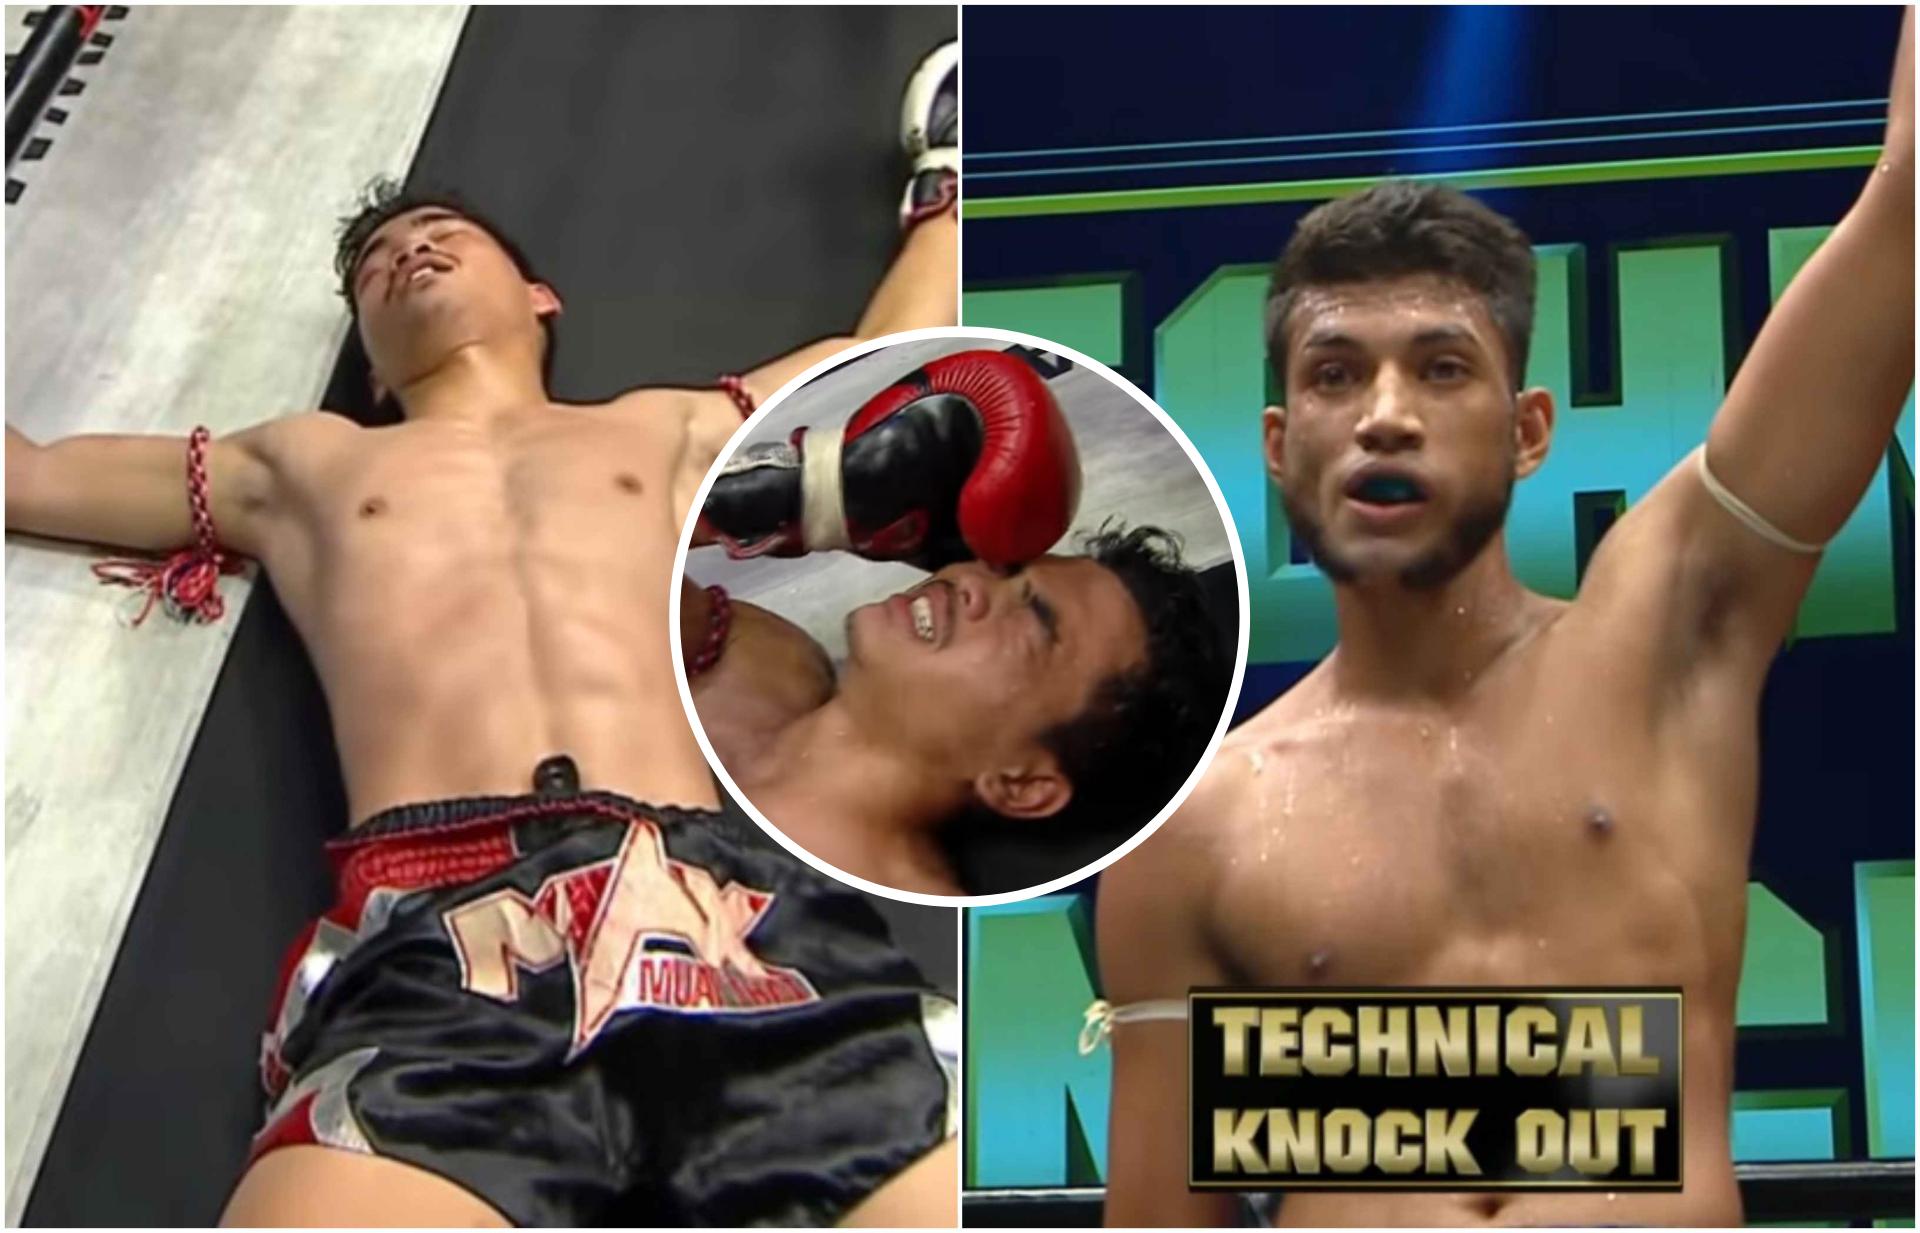 India's Surya Sagar scores a brutal KO win in a Muay Thai event in Thailand - Surya